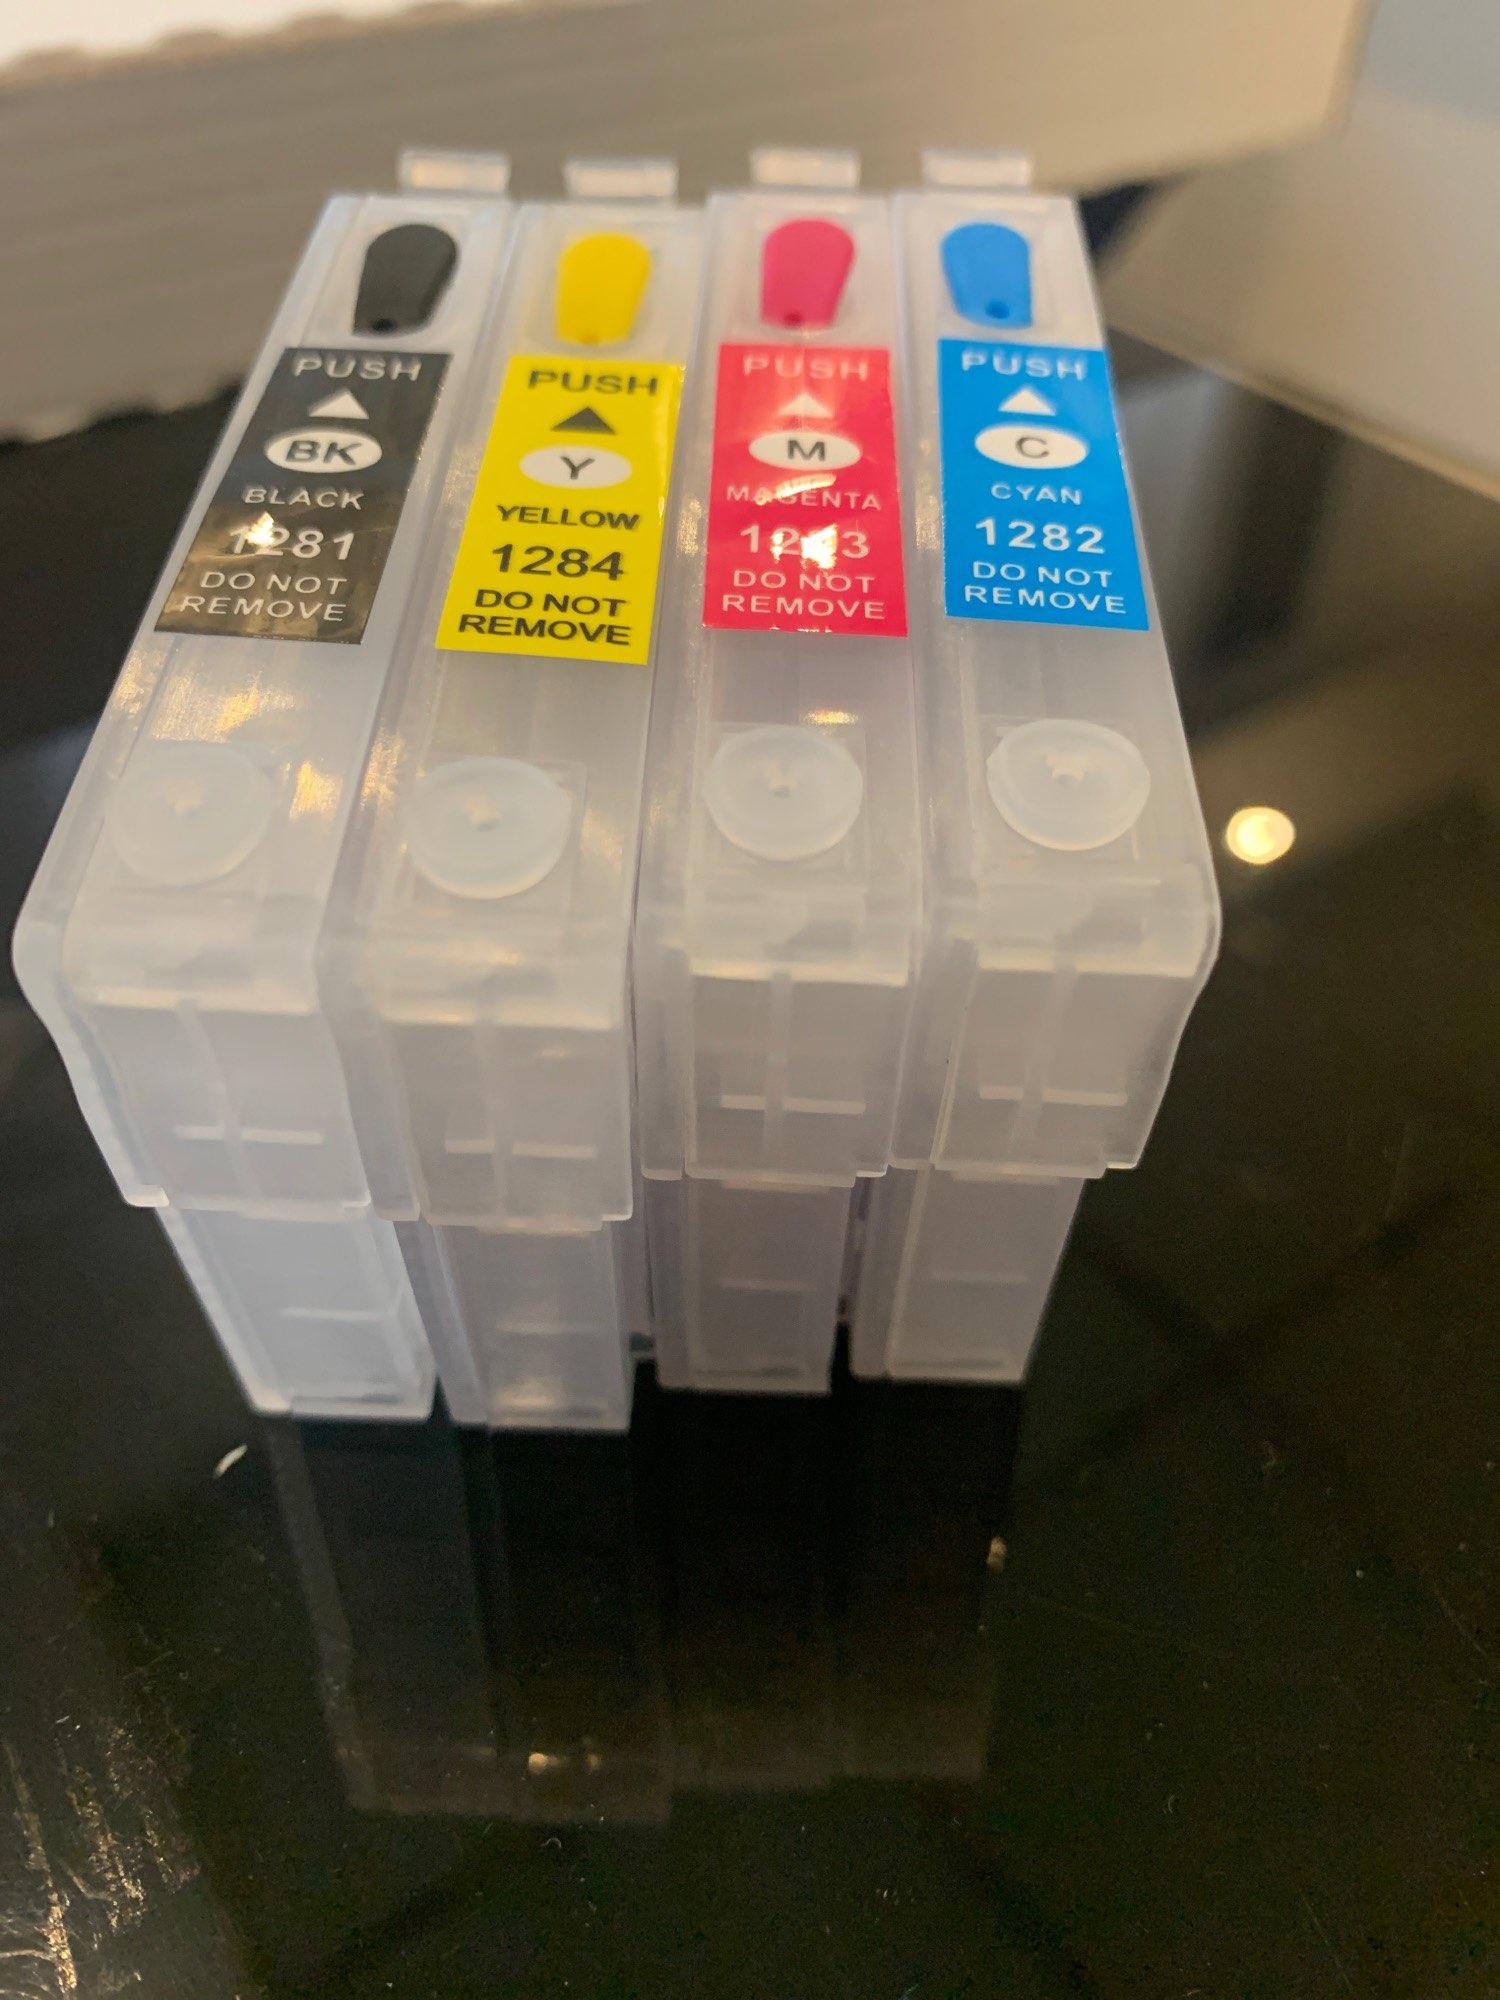 Dye Ink For EPSON Printers Premium 100ML 4 Color Ink BK C M Y for Epson Stylus TX106 TX109 TX117 TX119 C51 C91 CX4300 printer|dye ink|ink for epsoncolor ink - AliExpress